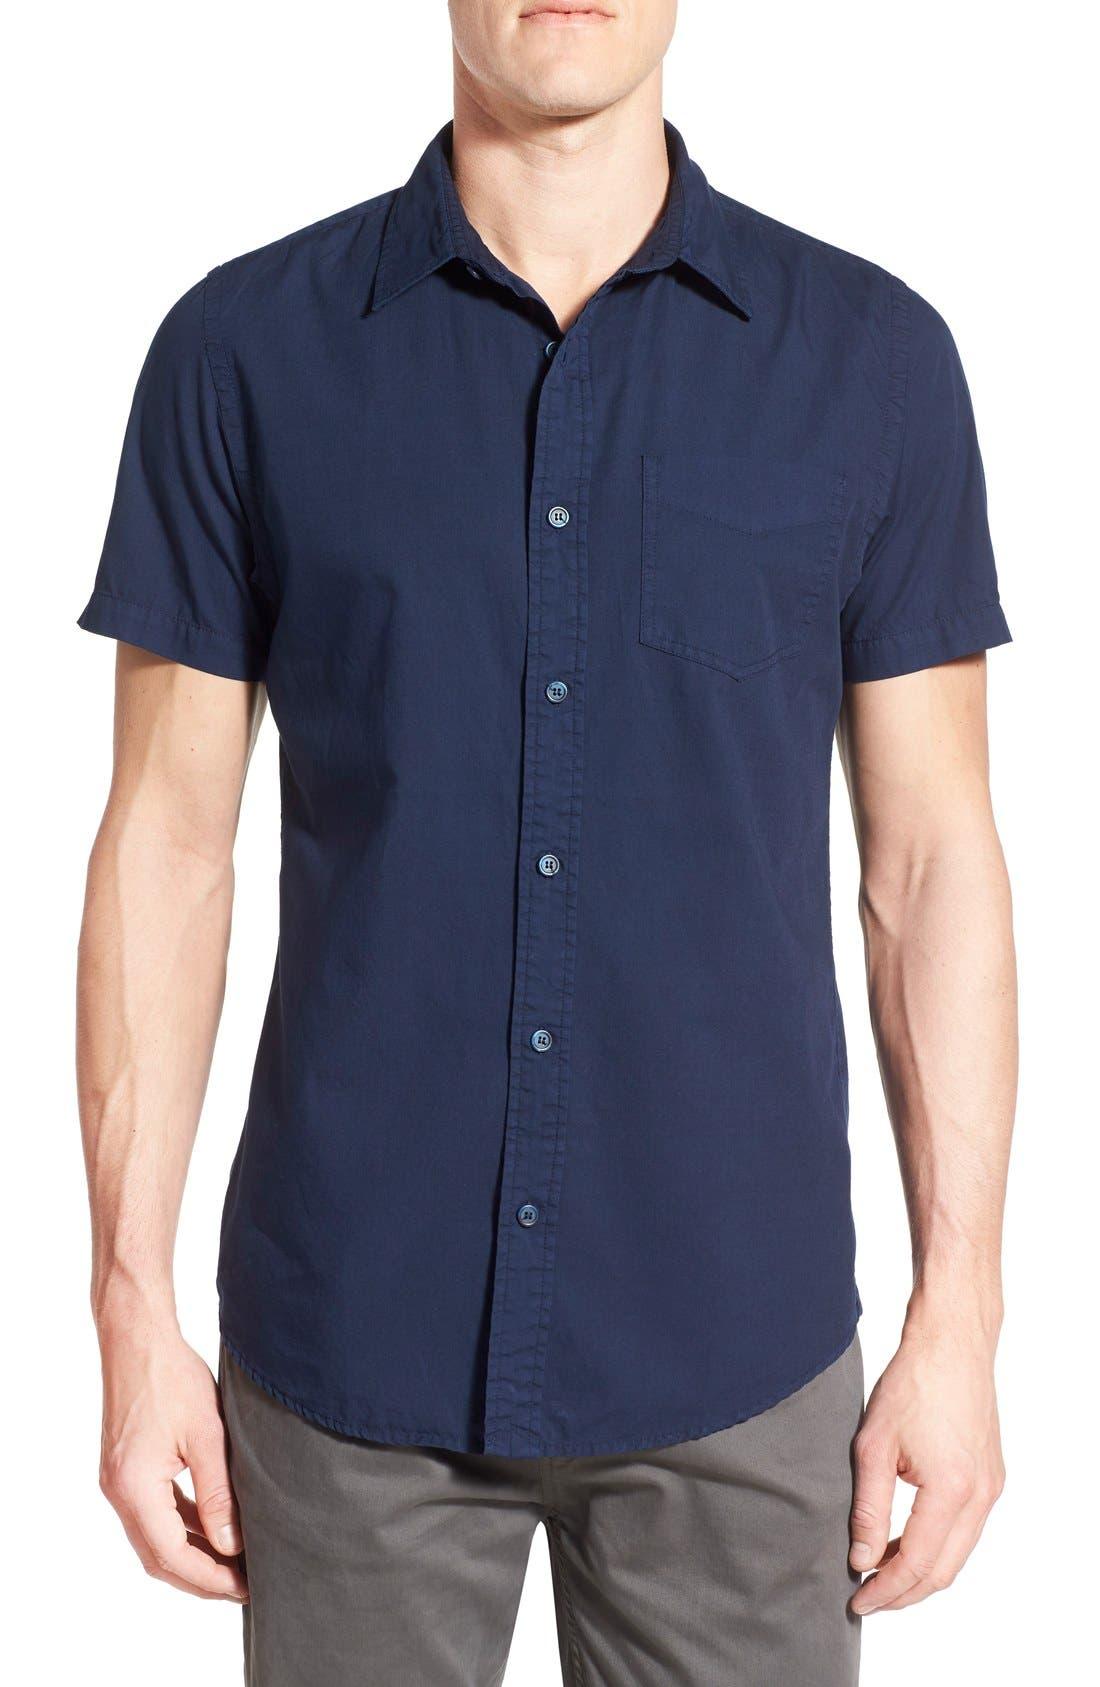 Alternate Image 1 Selected - Original Paperbacks 'Torino' Short Sleeve Woven Shirt